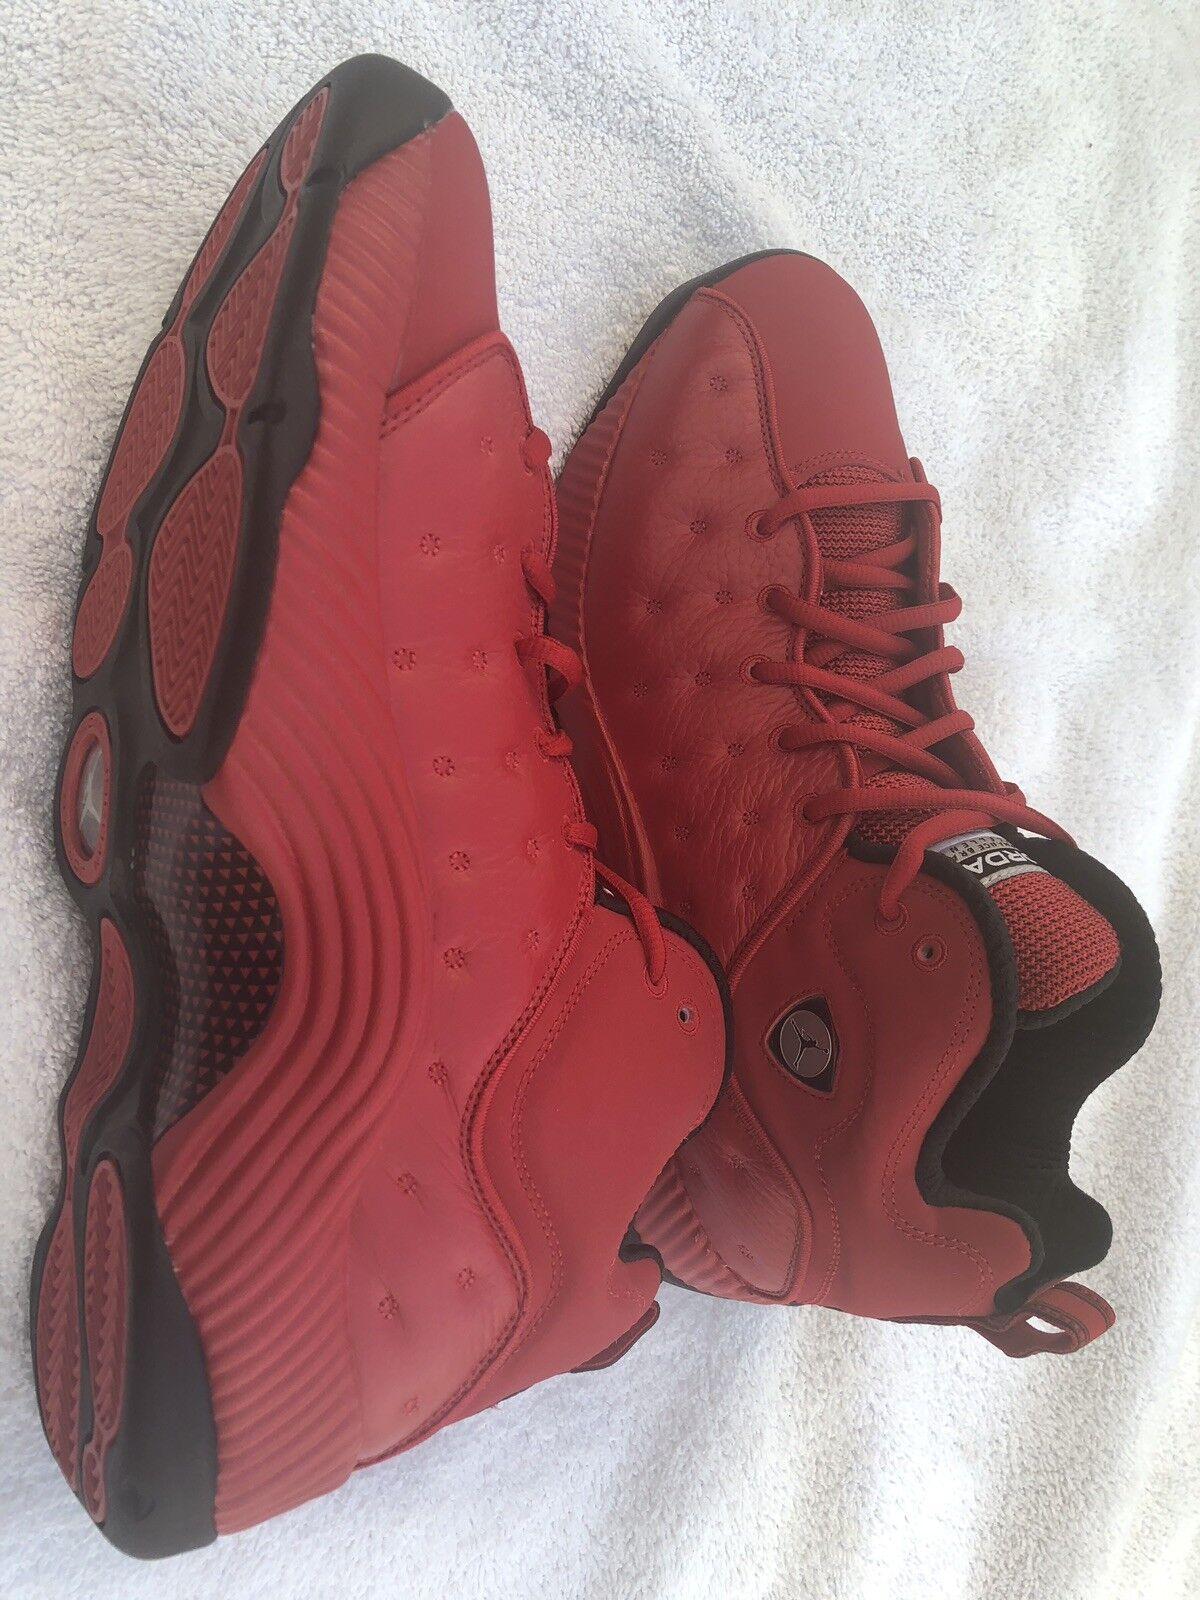 Nike air jordan bei ii jumpman team ii bei sneaker studio ROT 819175-602 größe. 24ebde